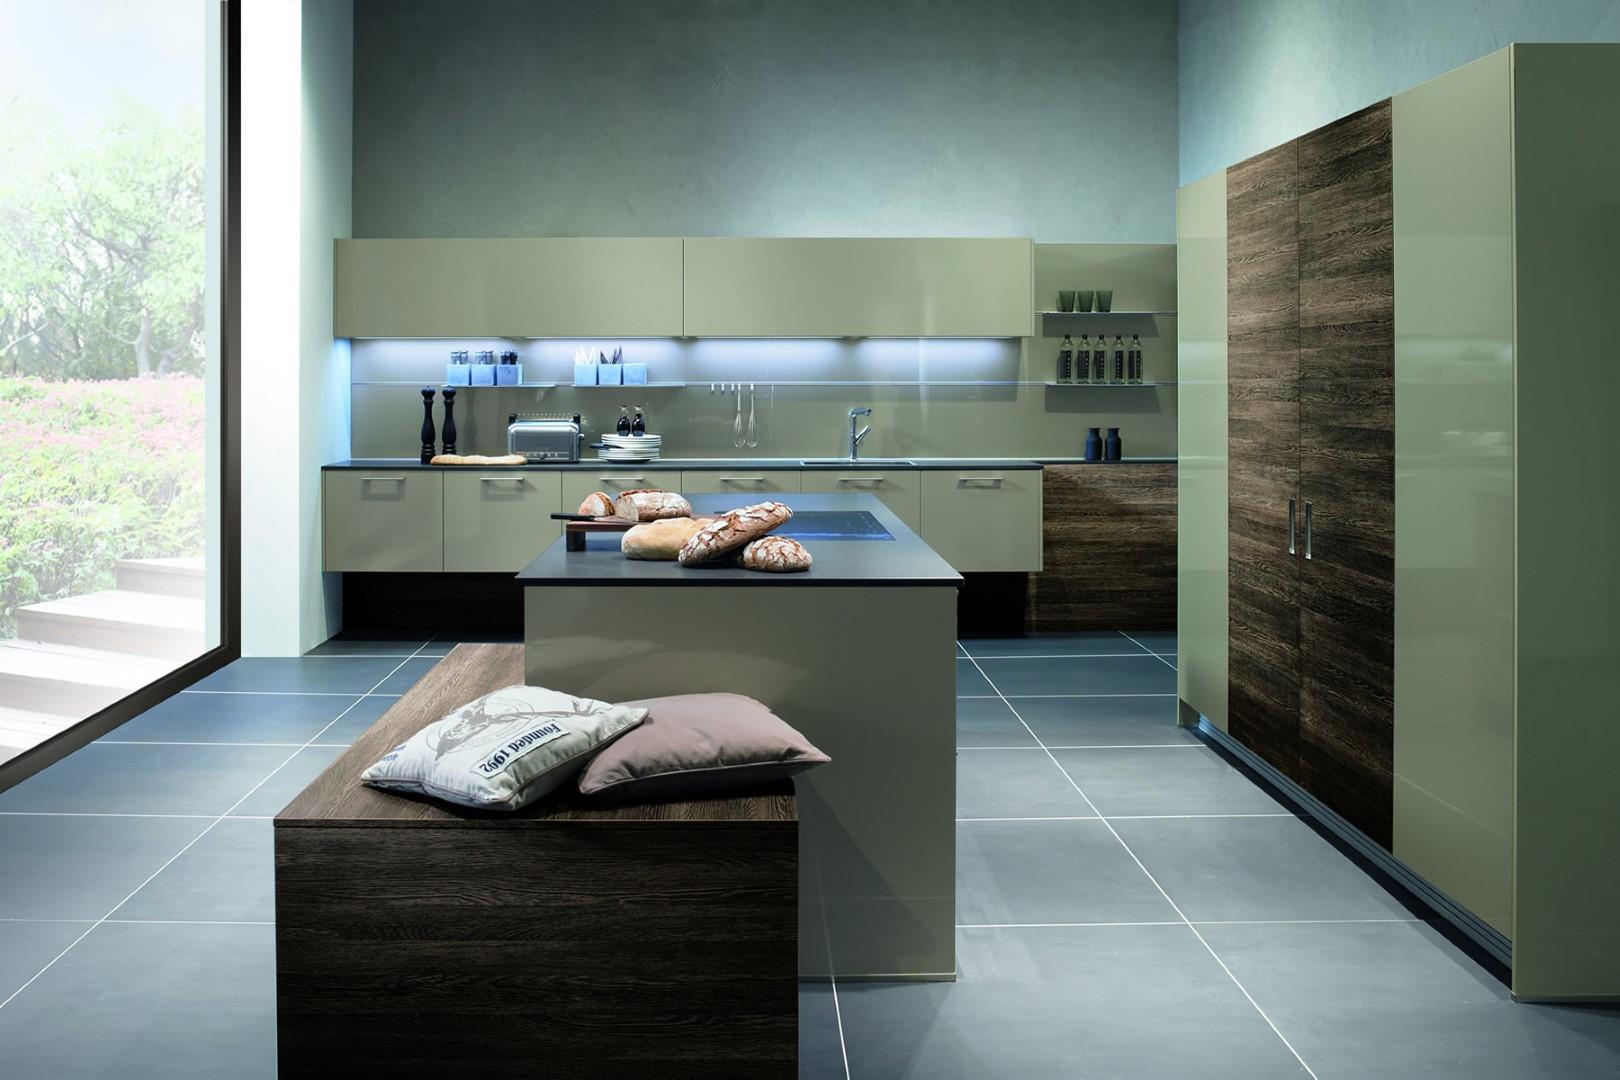 Fullscreen pronorm room66 cucine e arredamento a bolzano for Arredamento bolzano